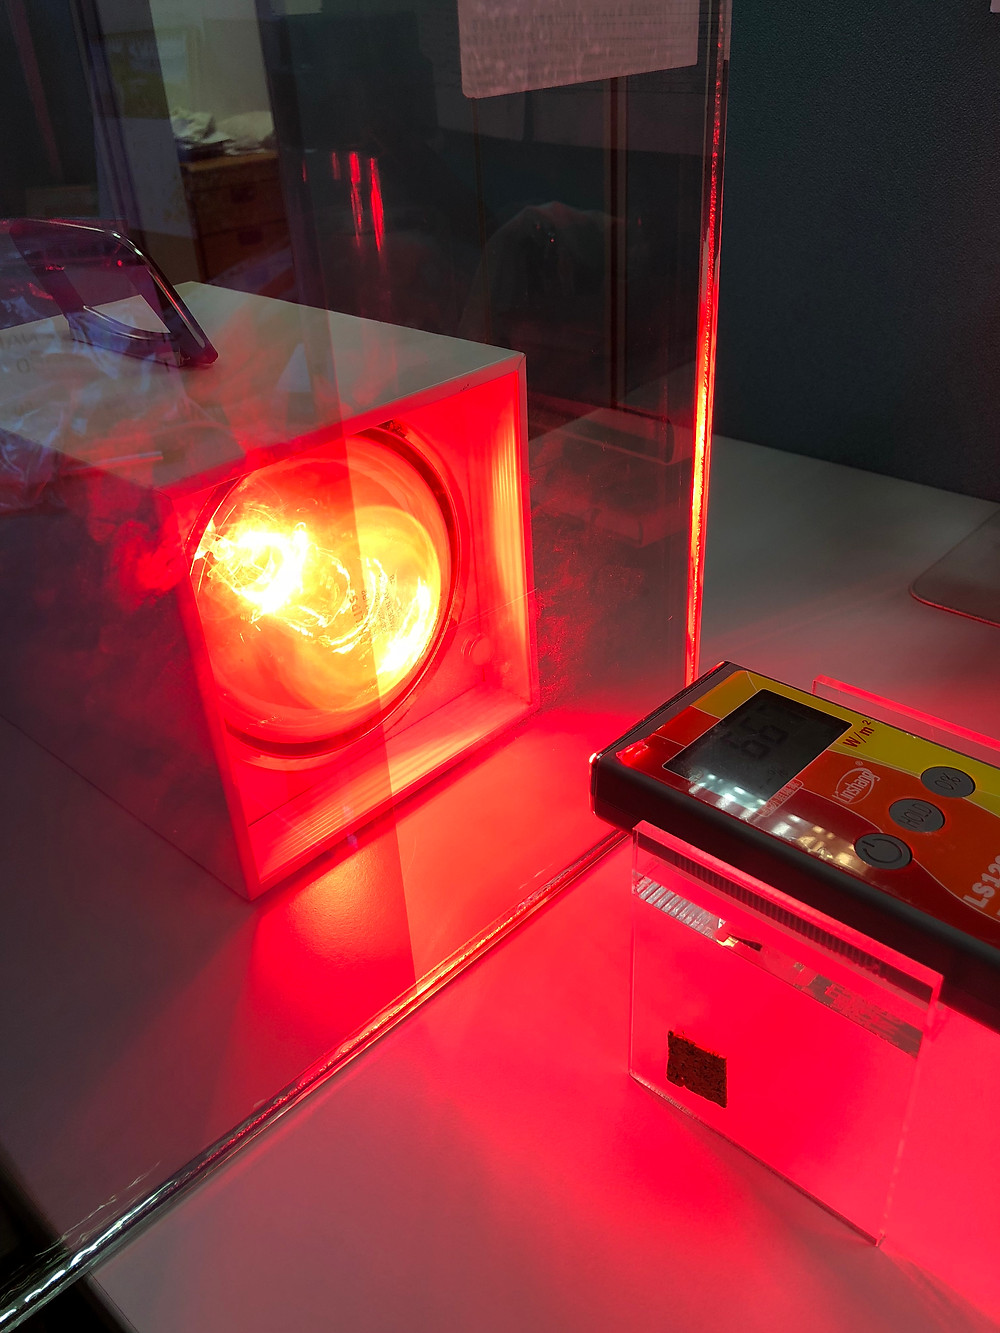 Heat lamp testing for window film